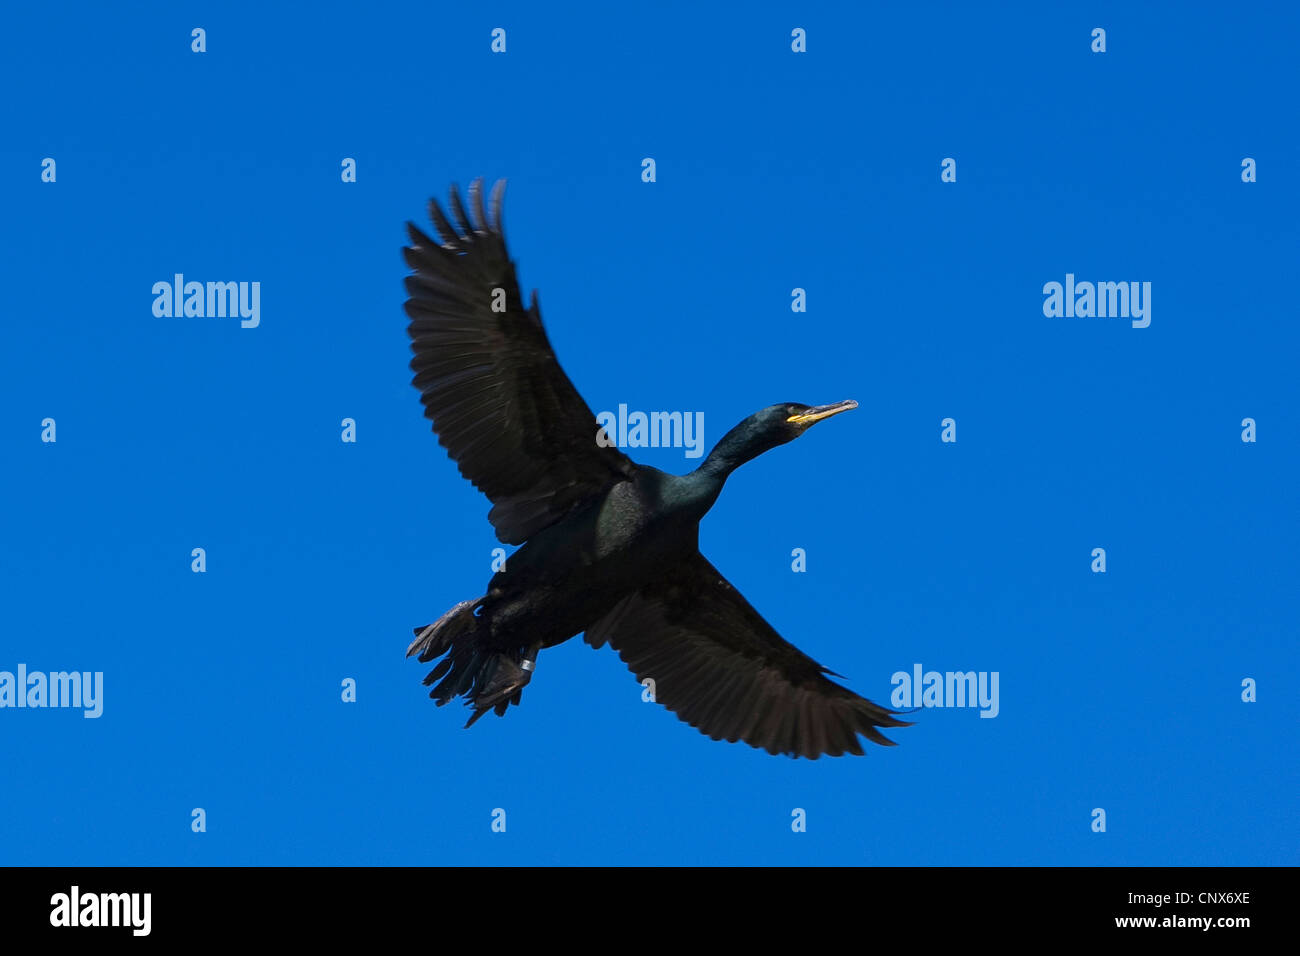 shag (Phalacrocorax aristotelis), flying, Germany - Stock Image